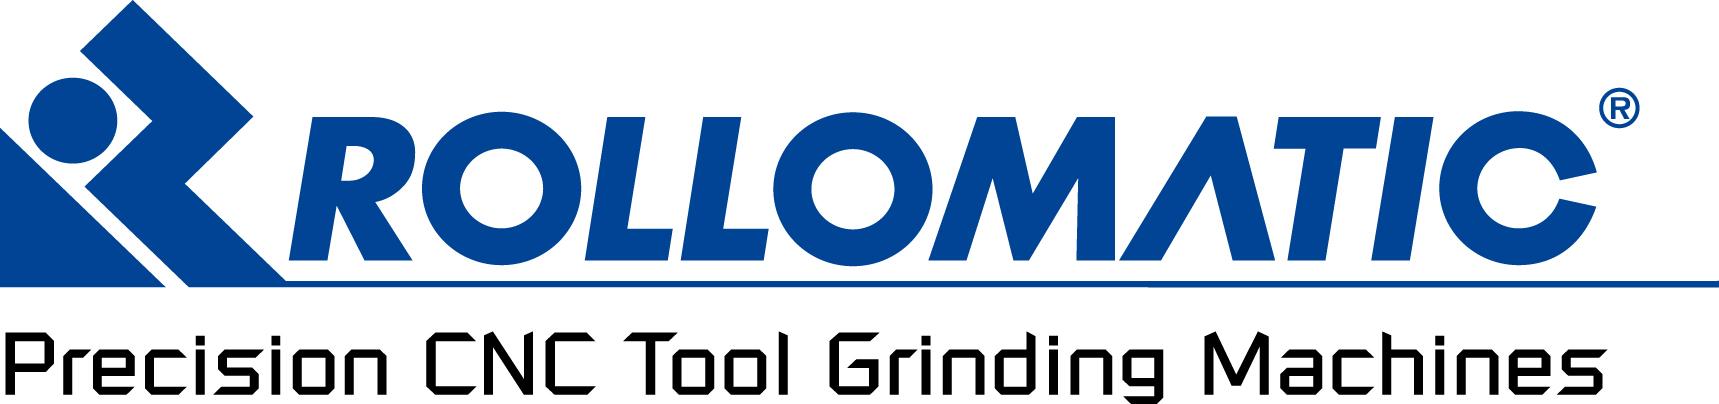 Rollo Tool Grinding